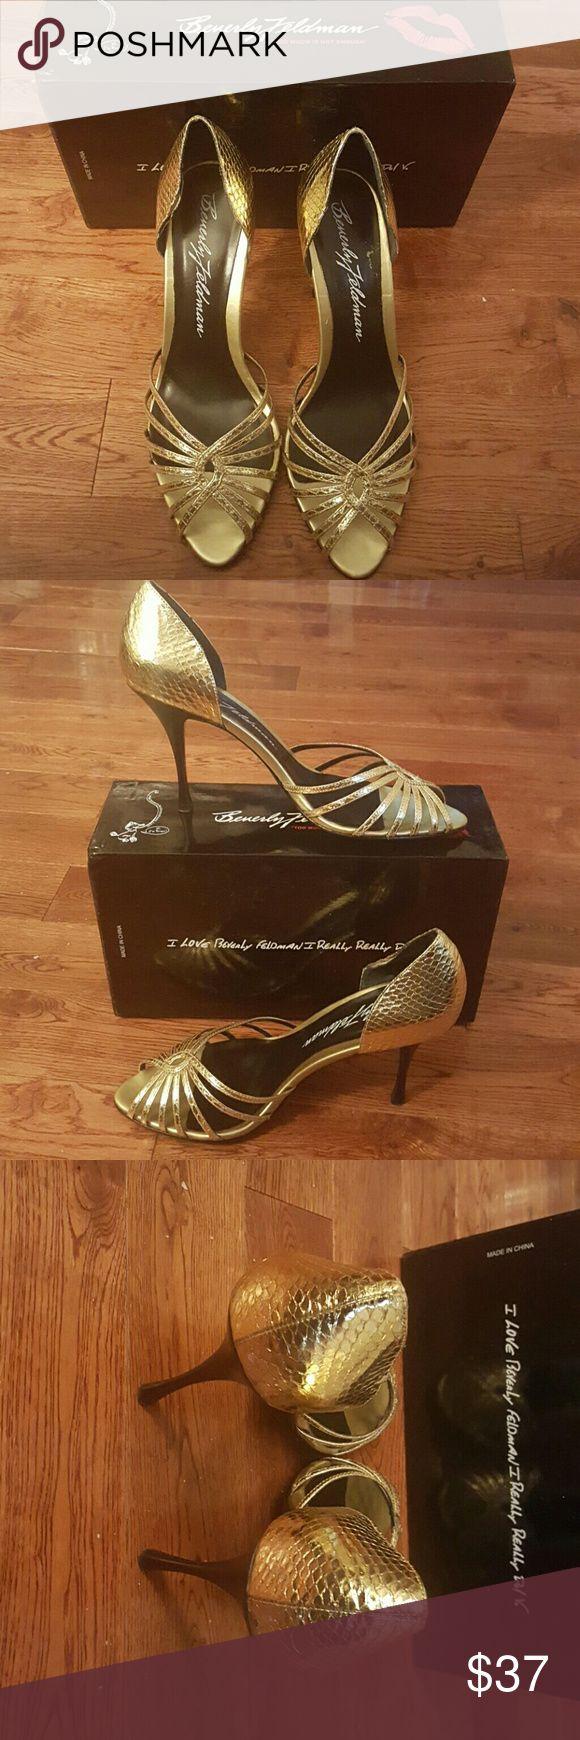 Beverly Feldman Gold High Heel Sandal 10 Very minimal wear. Very sexy yet classy shoe. Purchased originally from a designer shoe warehouse. Size 10 Beverly Feldman Shoes Heels